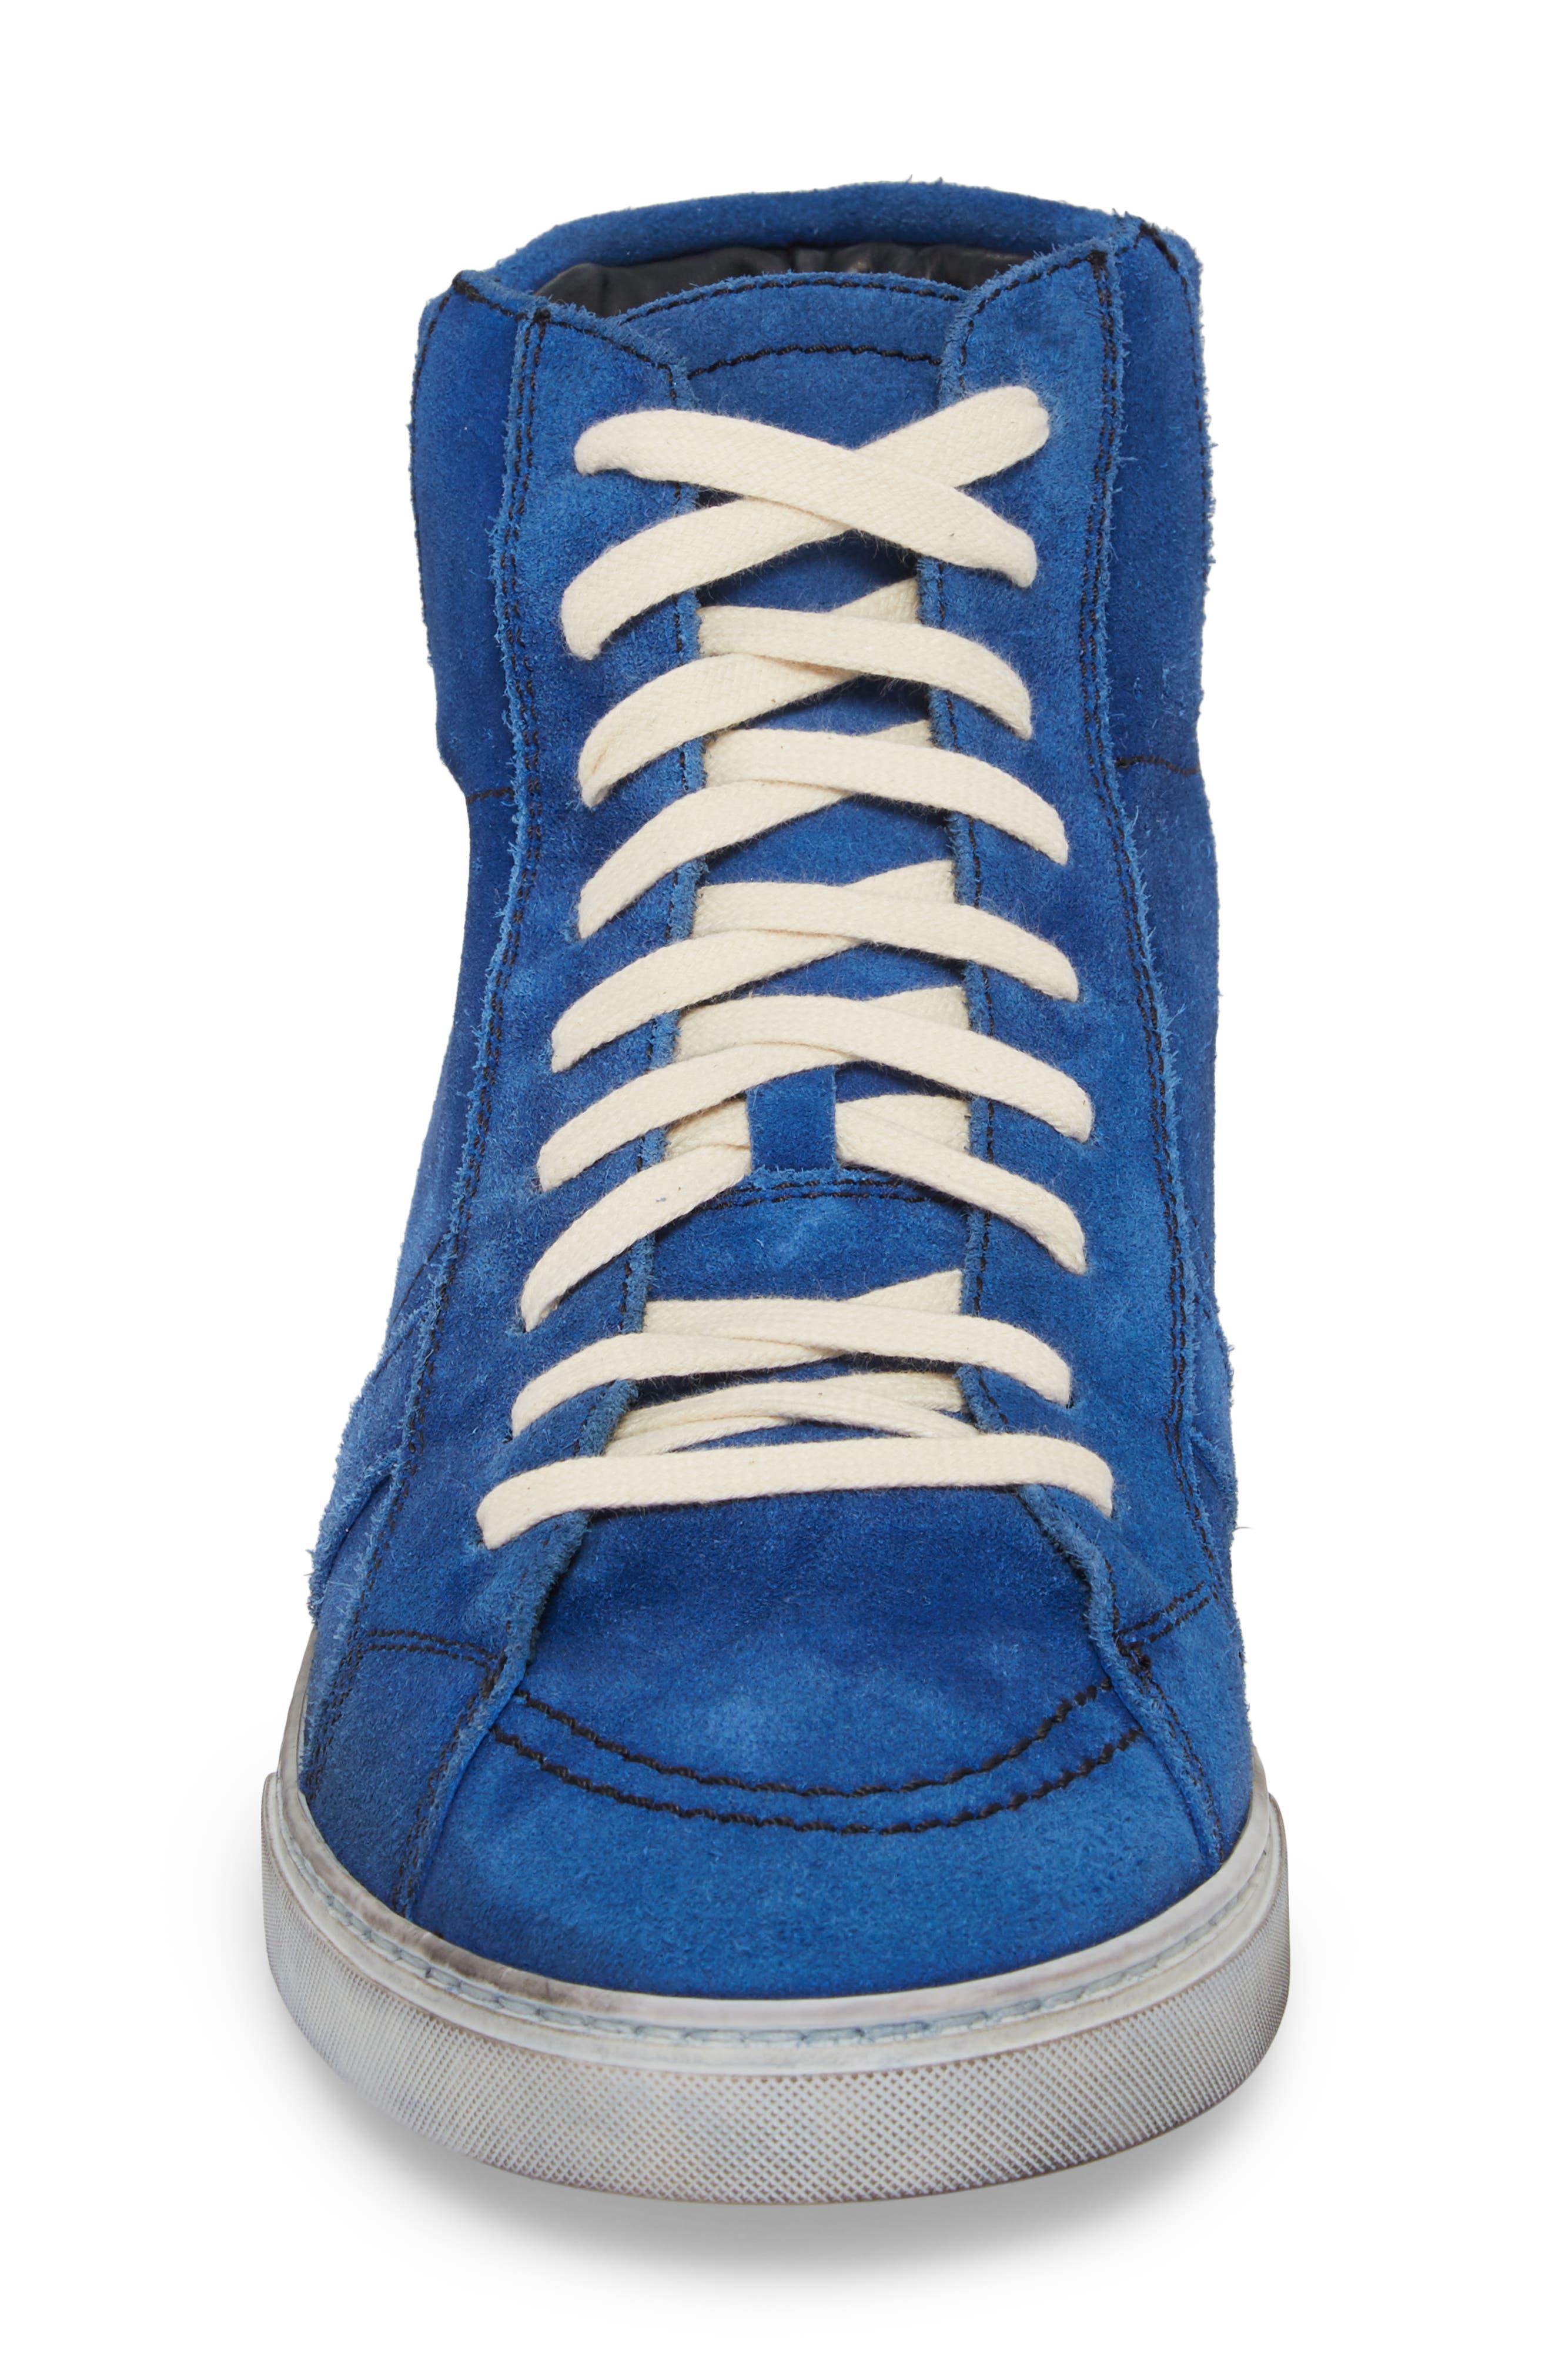 High Top Sneaker,                             Alternate thumbnail 4, color,                             400